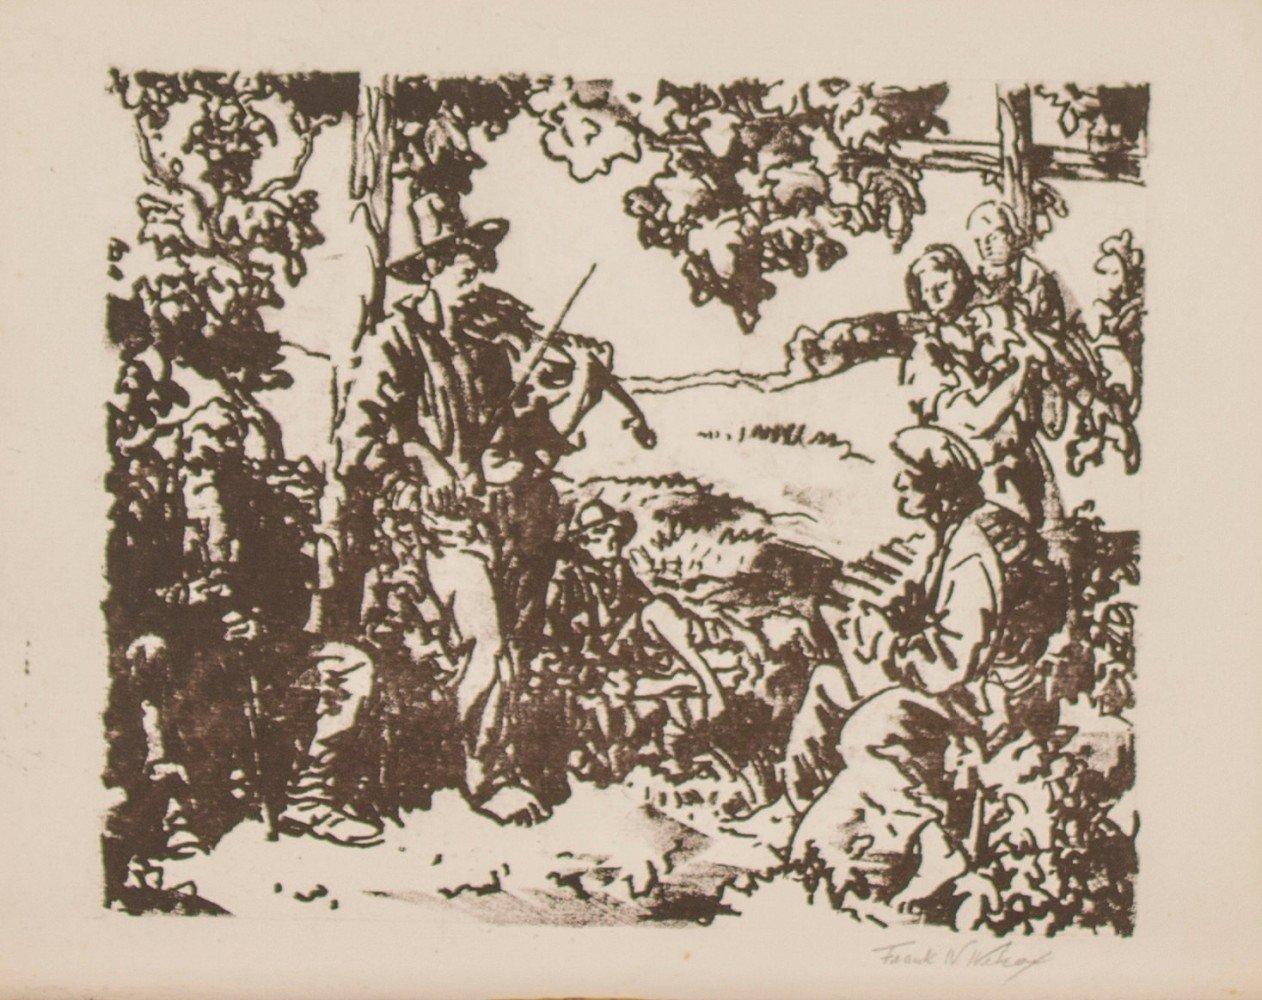 Italian Musicians/Quarrymen in Brecksville by Frank Nelson Wilcox